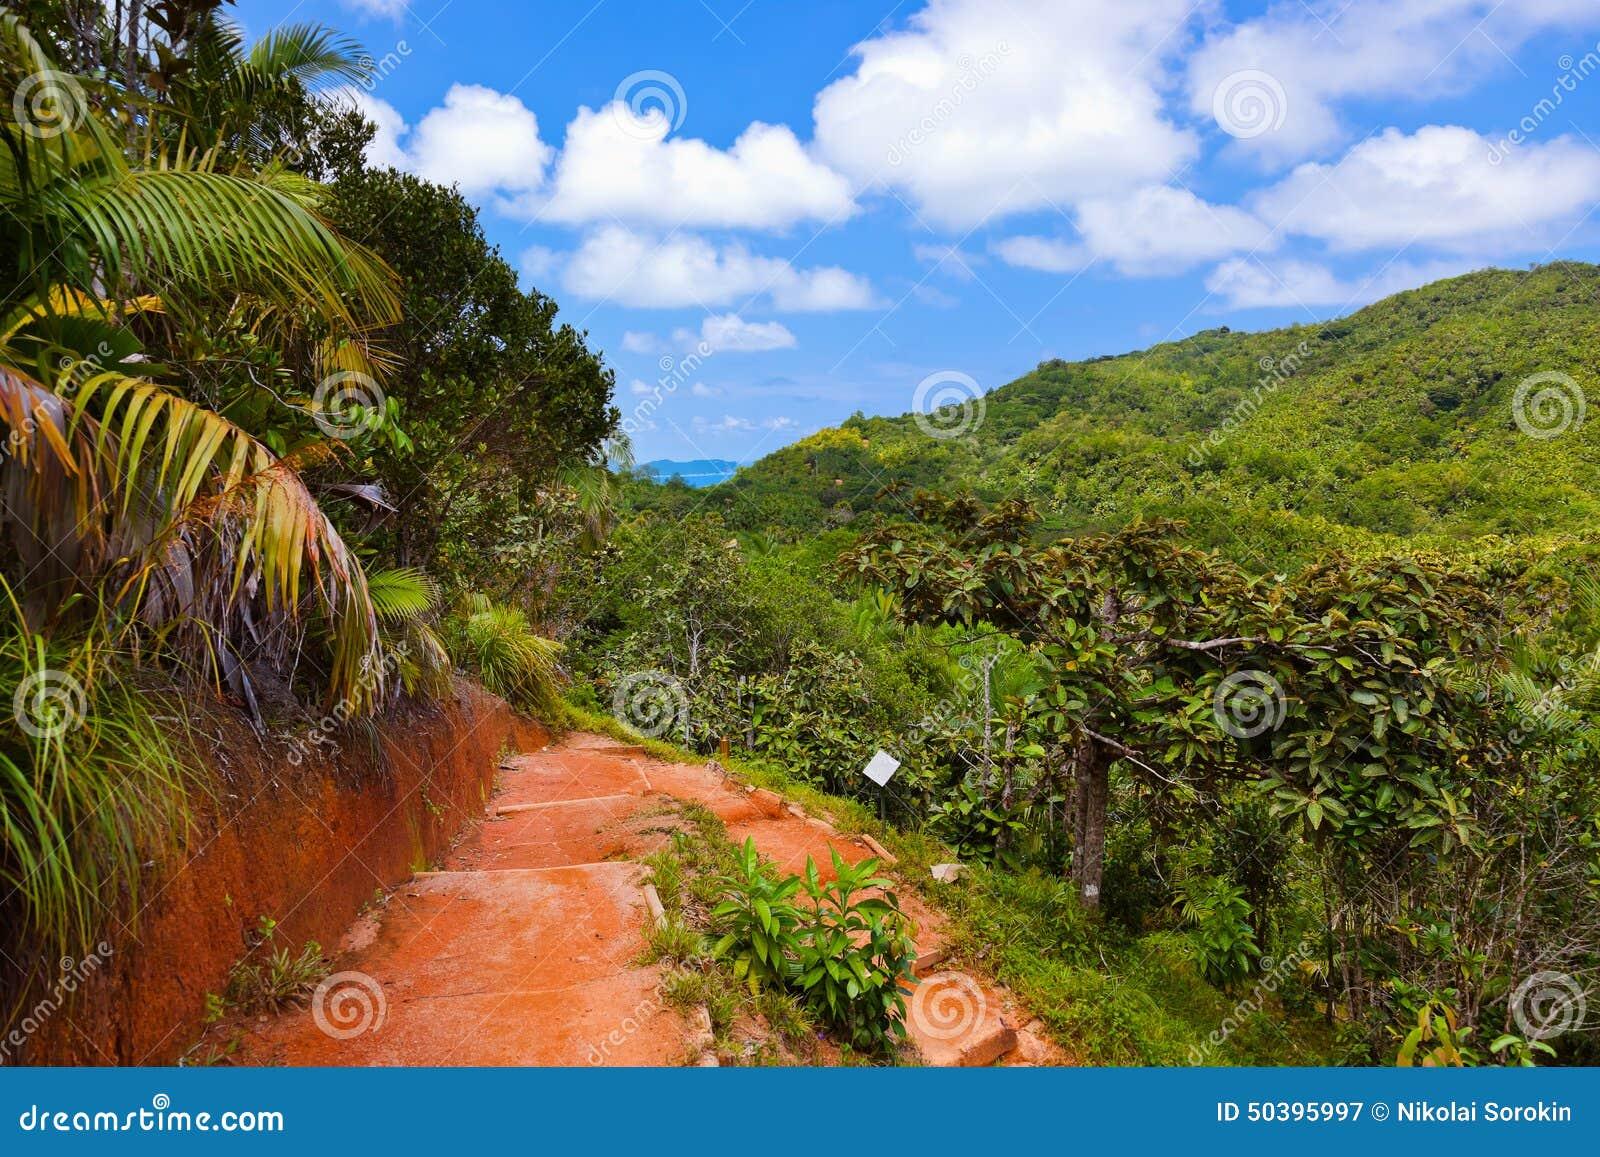 Camino en la selva - Vallee del Mai - Seychelles